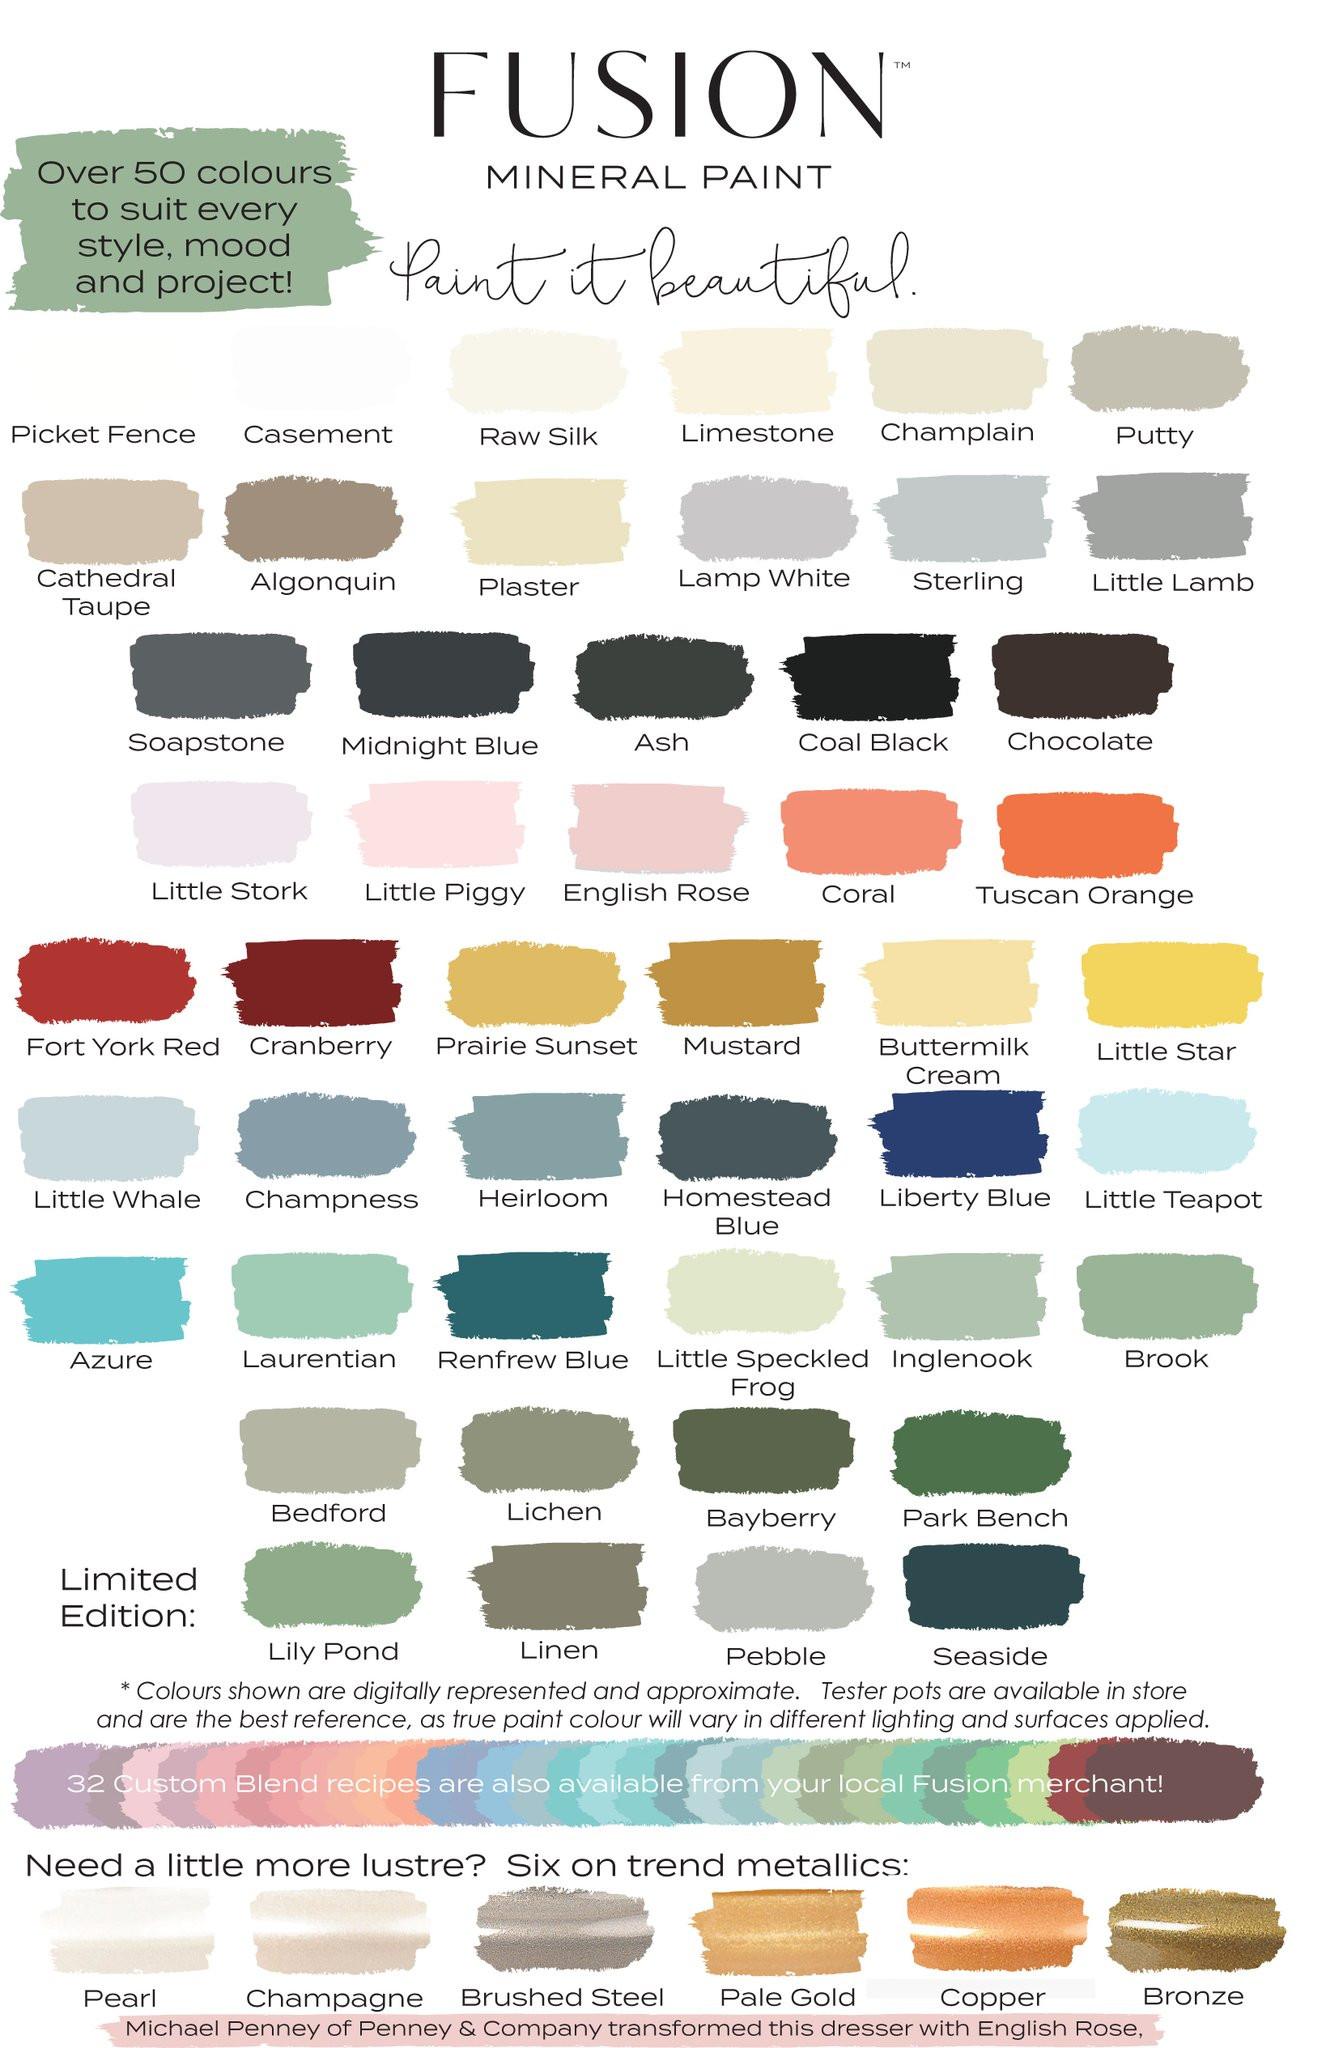 Best ideas about Fusion Mineral Paint Colors . Save or Pin Fusion Mineral Paint – Emily Rose Vintage Now.